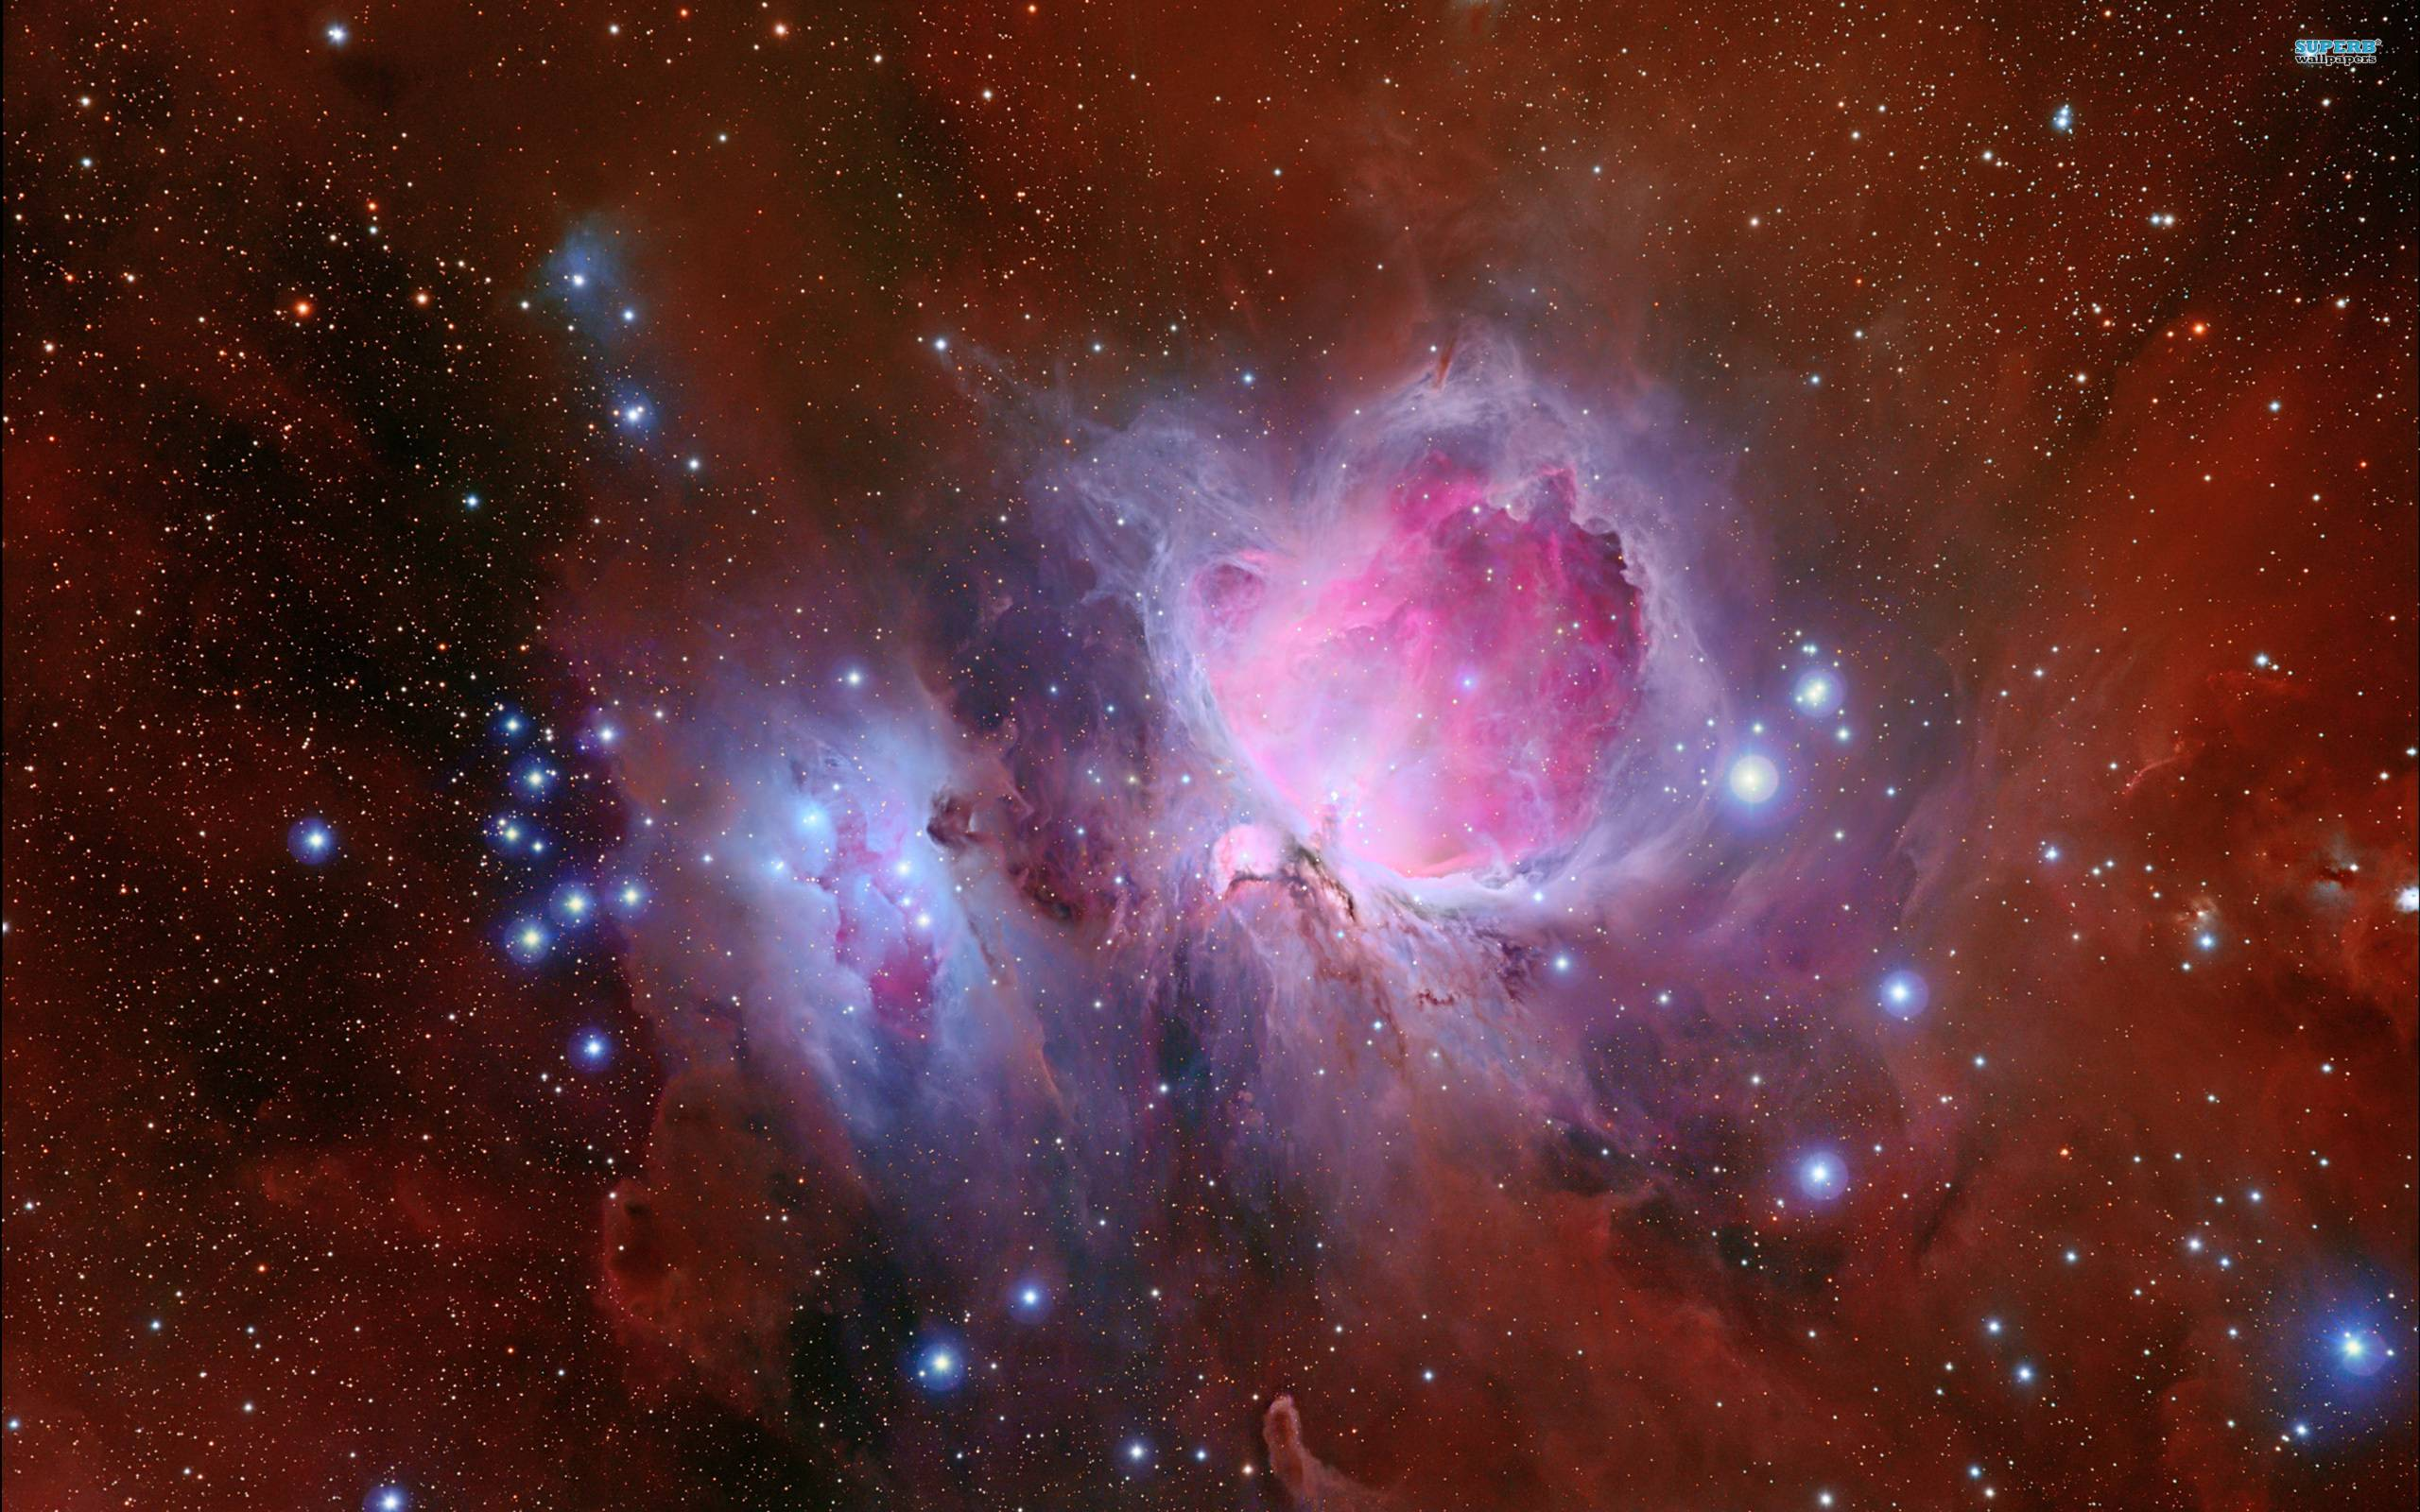 Orion Nebula Hd Wallpaper Orion Nebula Wallpapers Wallpaper Cave